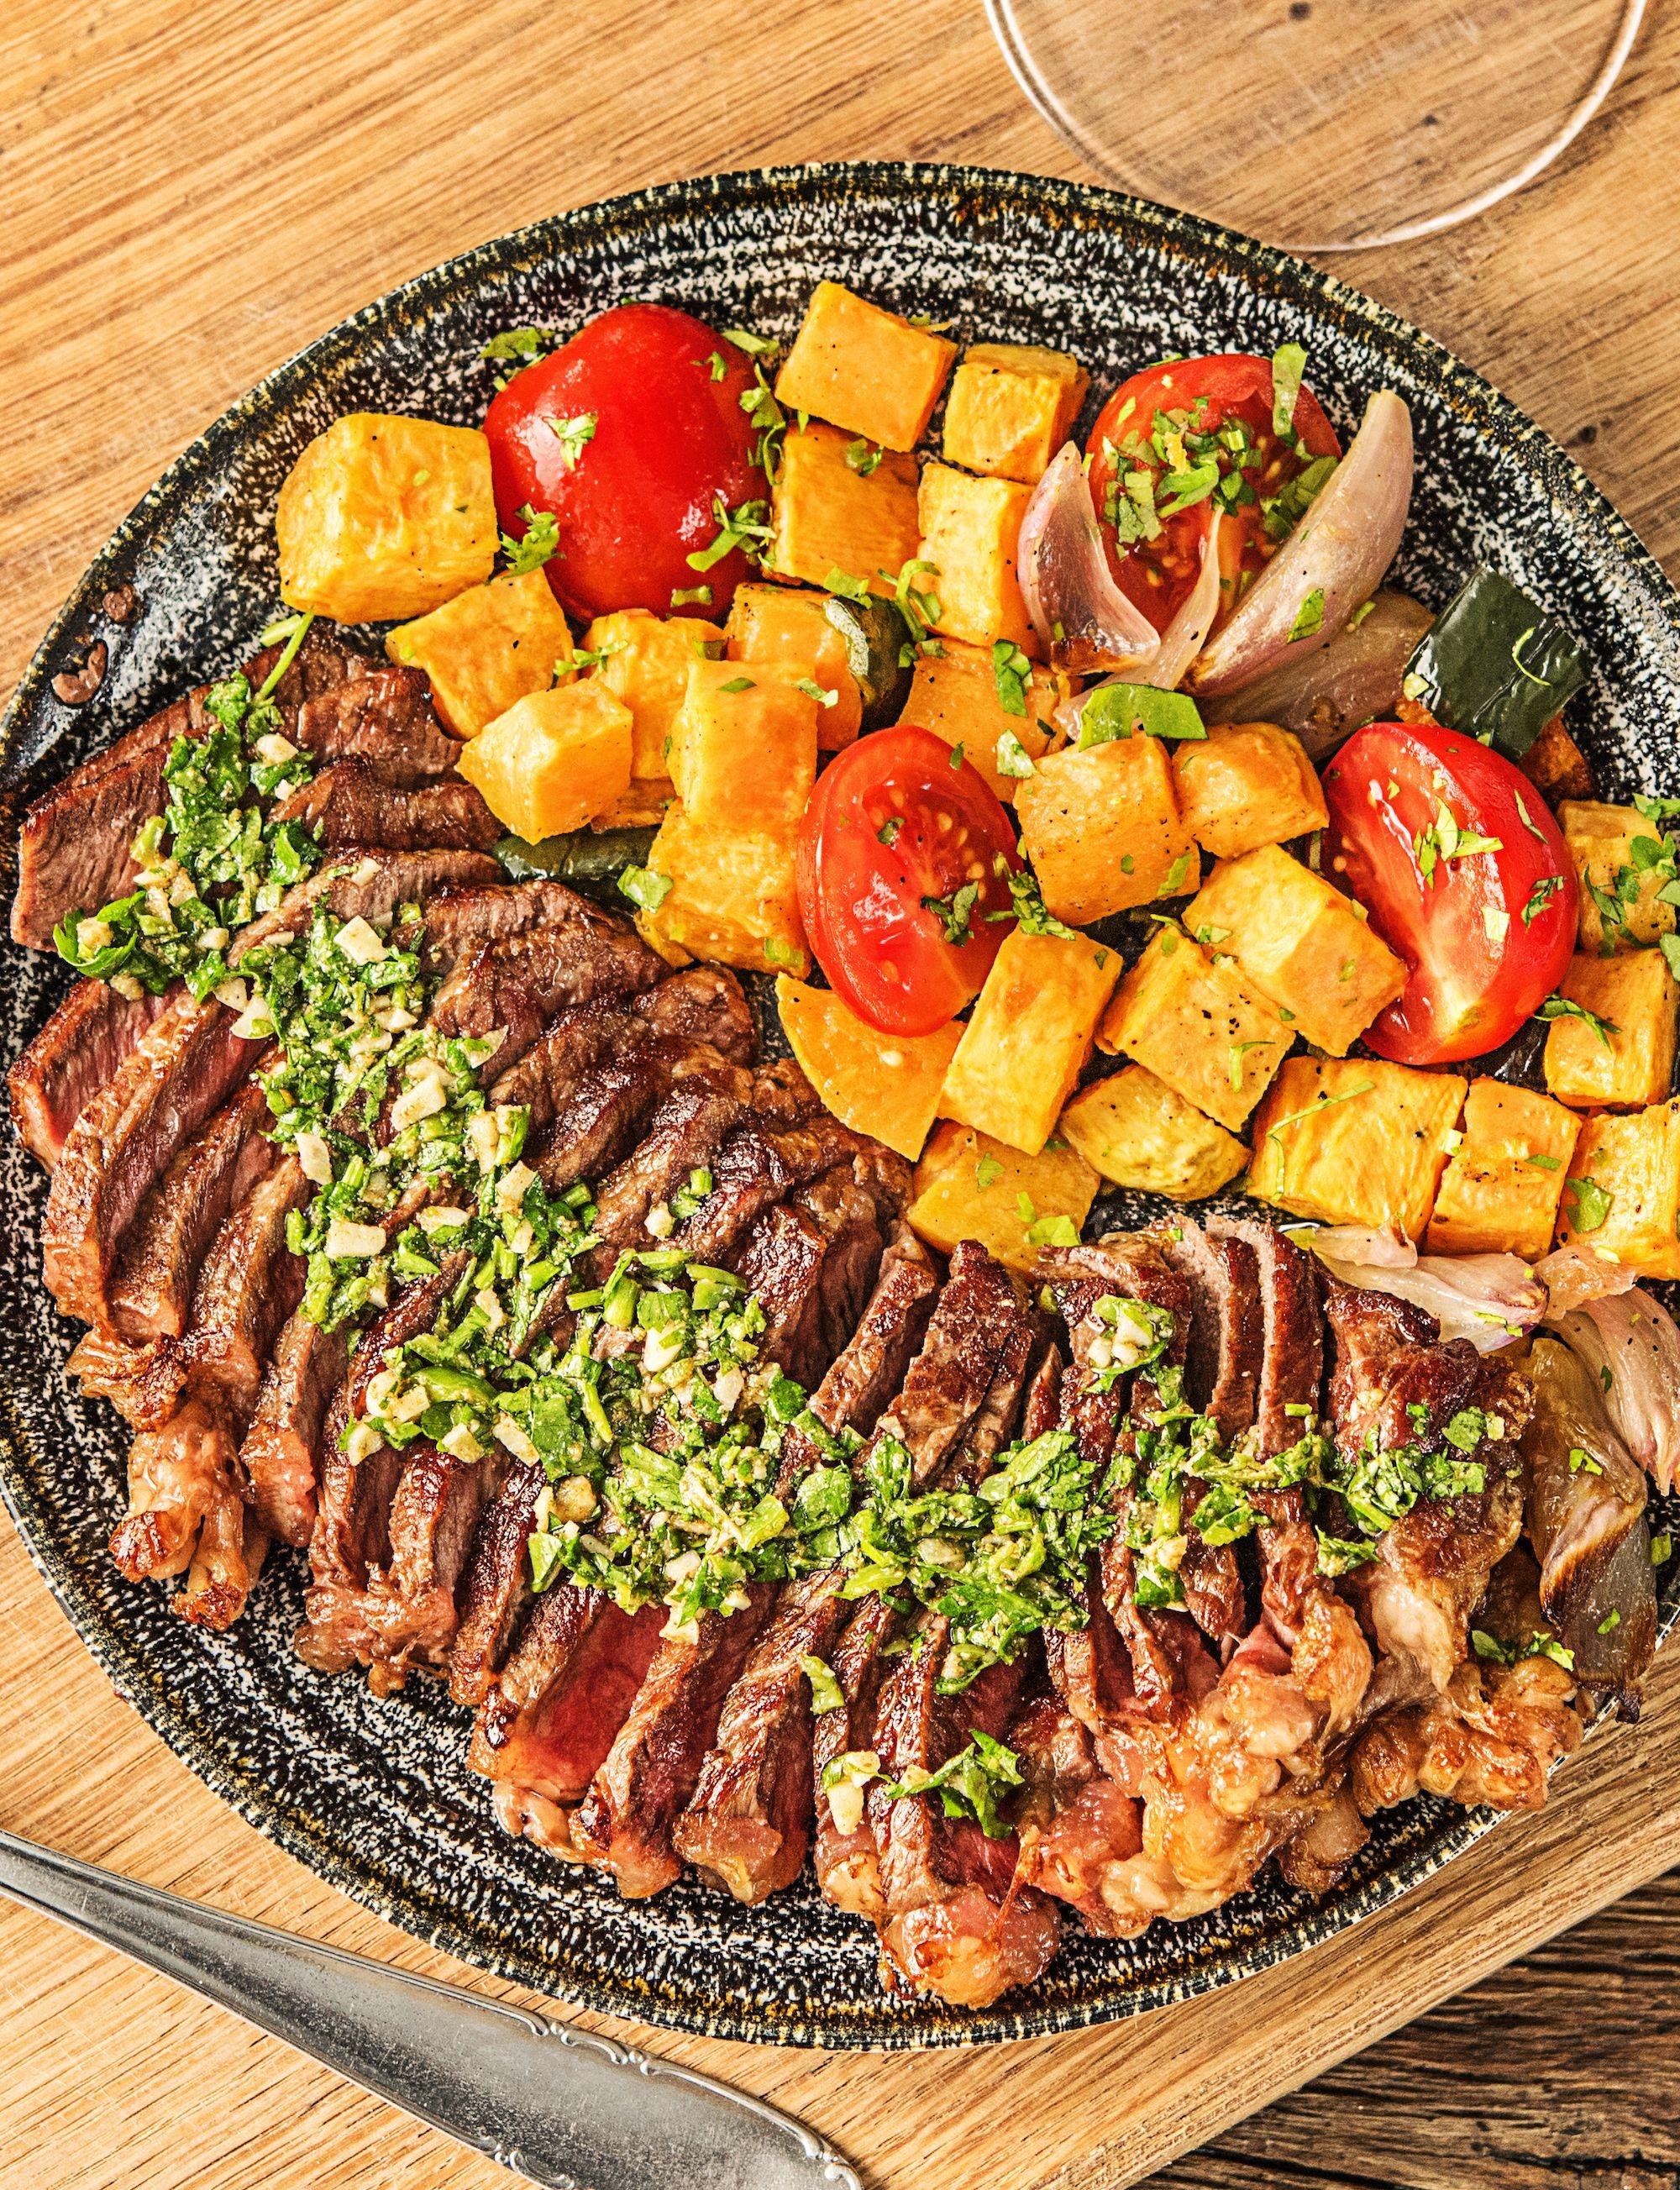 Argentine Chimichurri Steak Recipe Hellofresh Recipe Healthy Steak Recipes Salad With Sweet Potato Healthy Steak